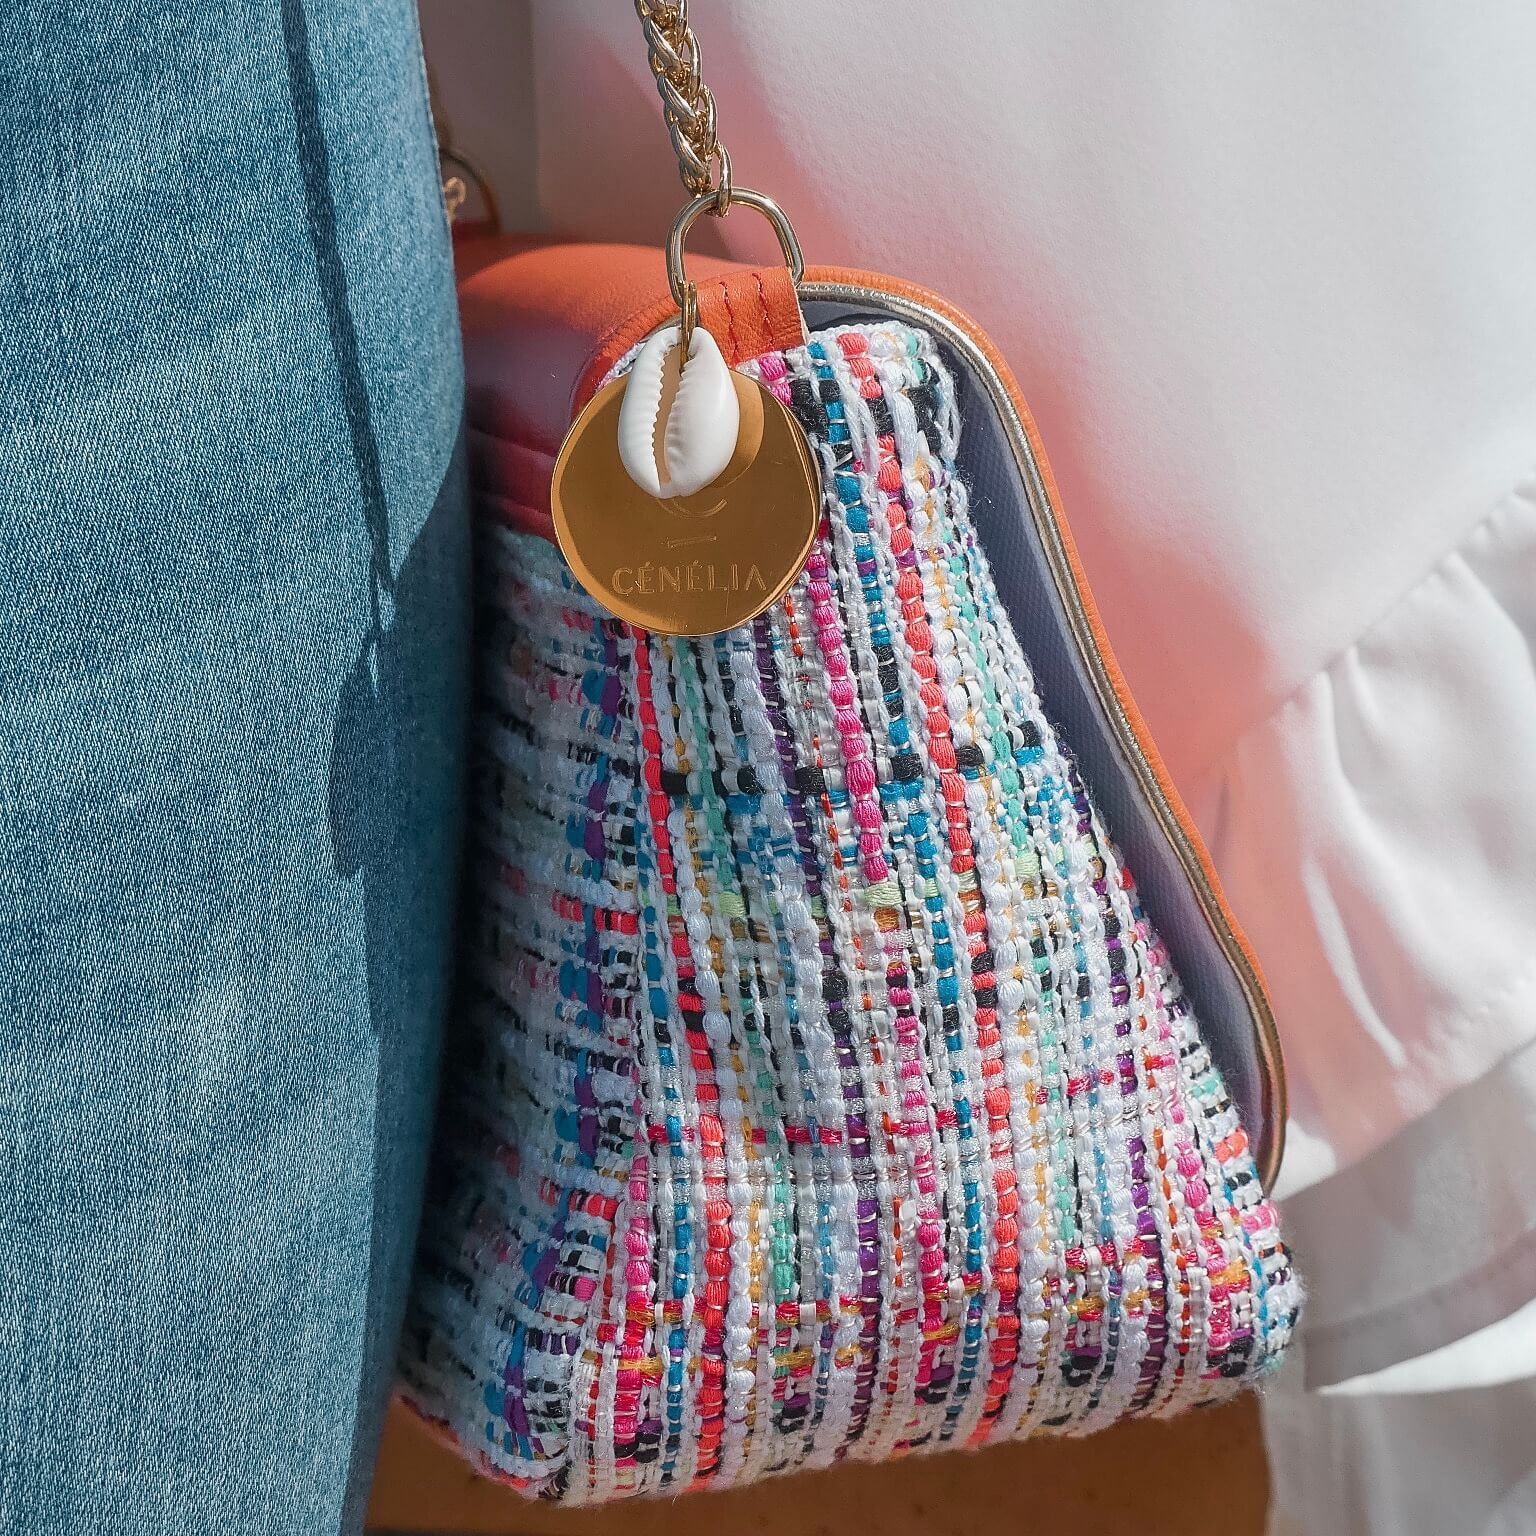 sac mode en tweed - sac femme bandoulière chaine Cénélia